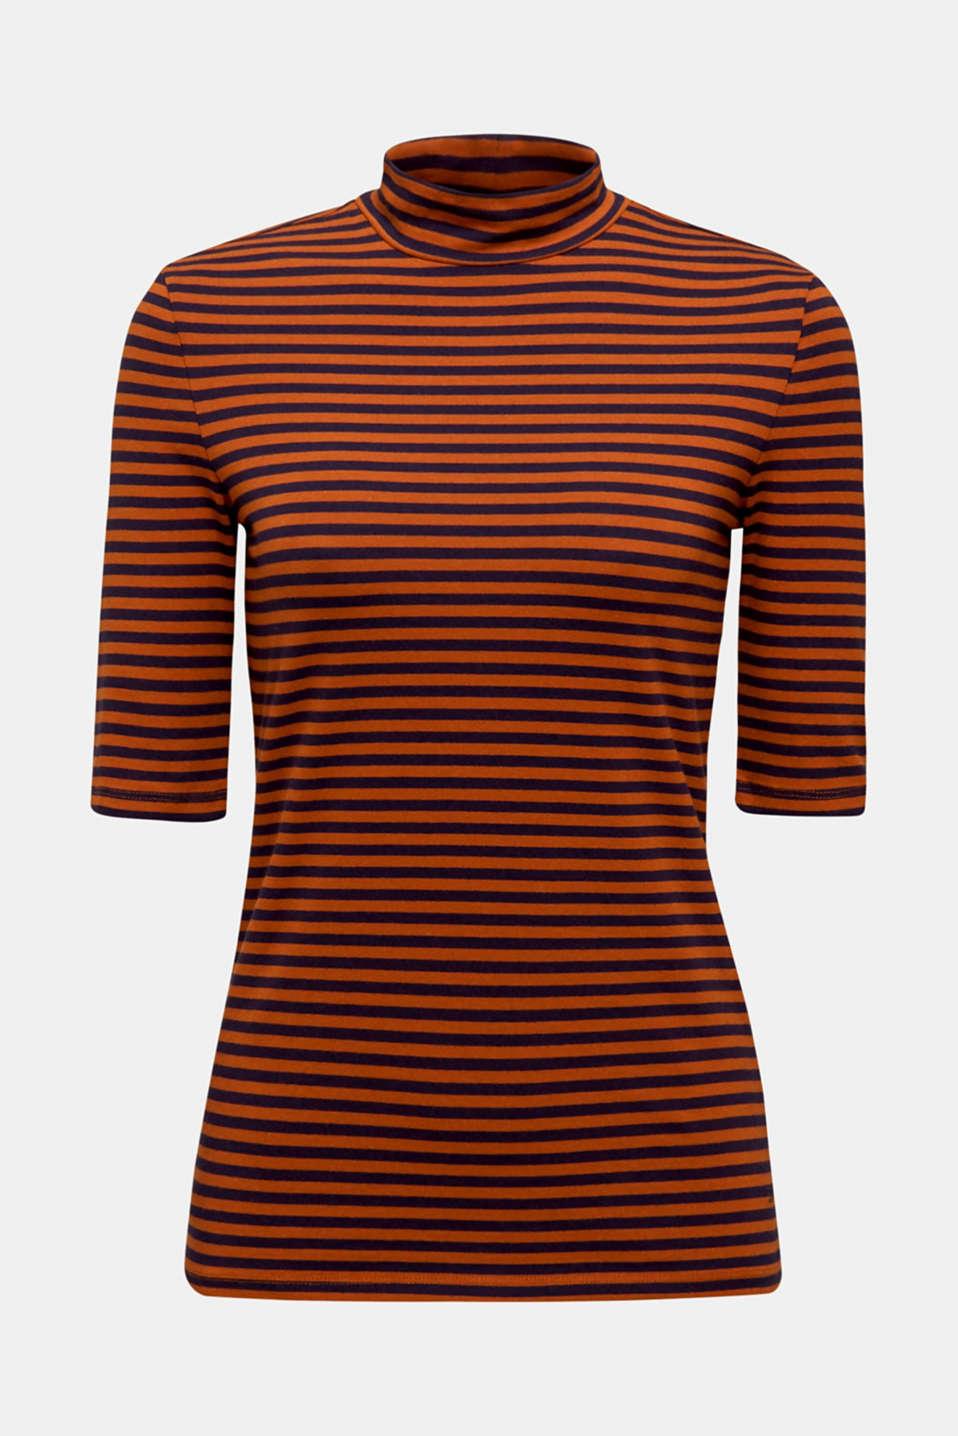 T-Shirts, CINNAMON 4, detail image number 5